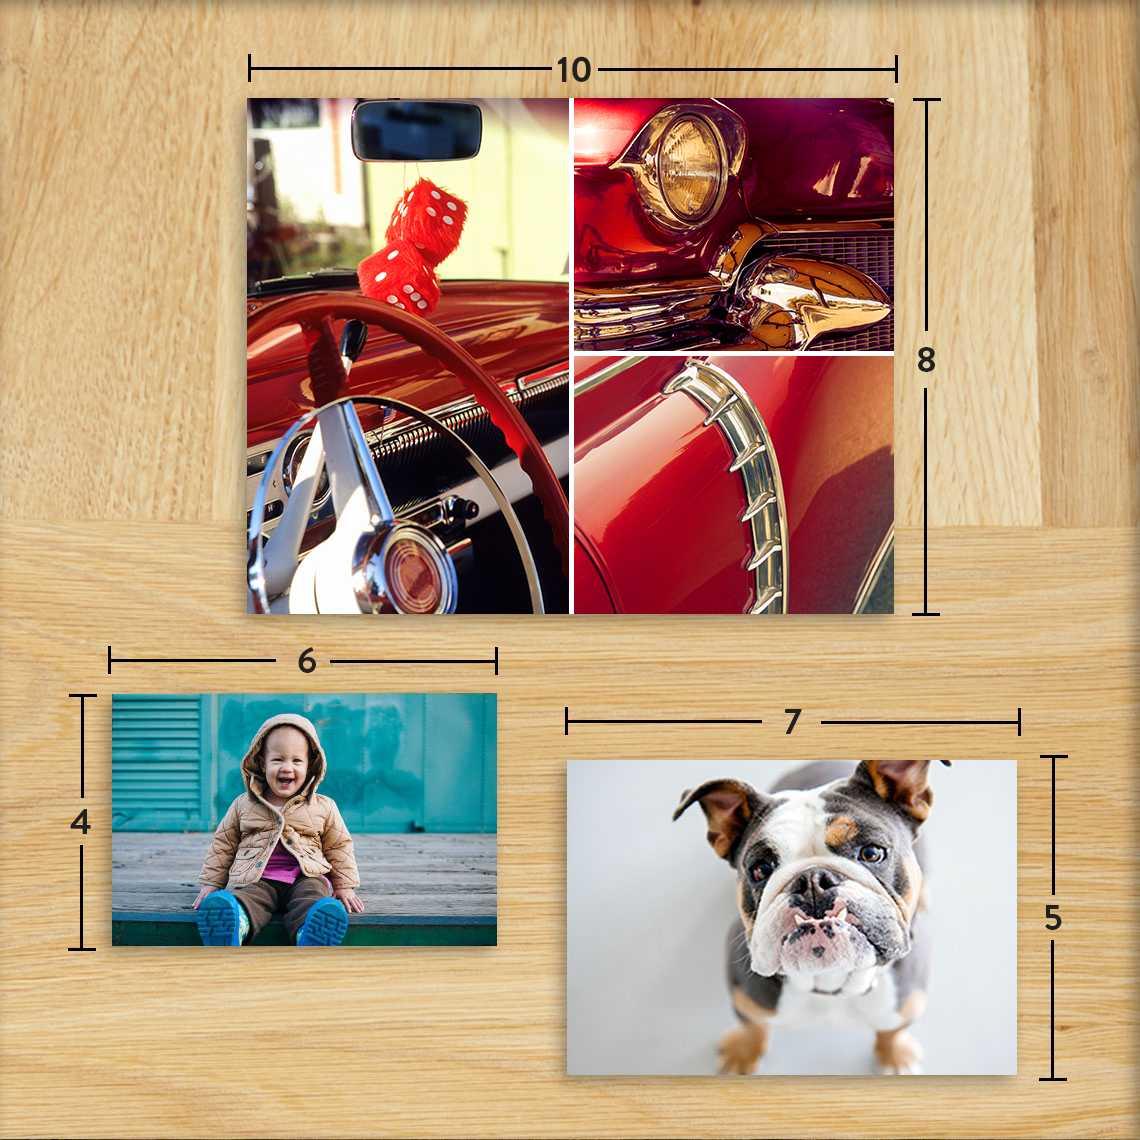 Collage Prints, 5x7 | Collage Prints | Prints | Snapfish US